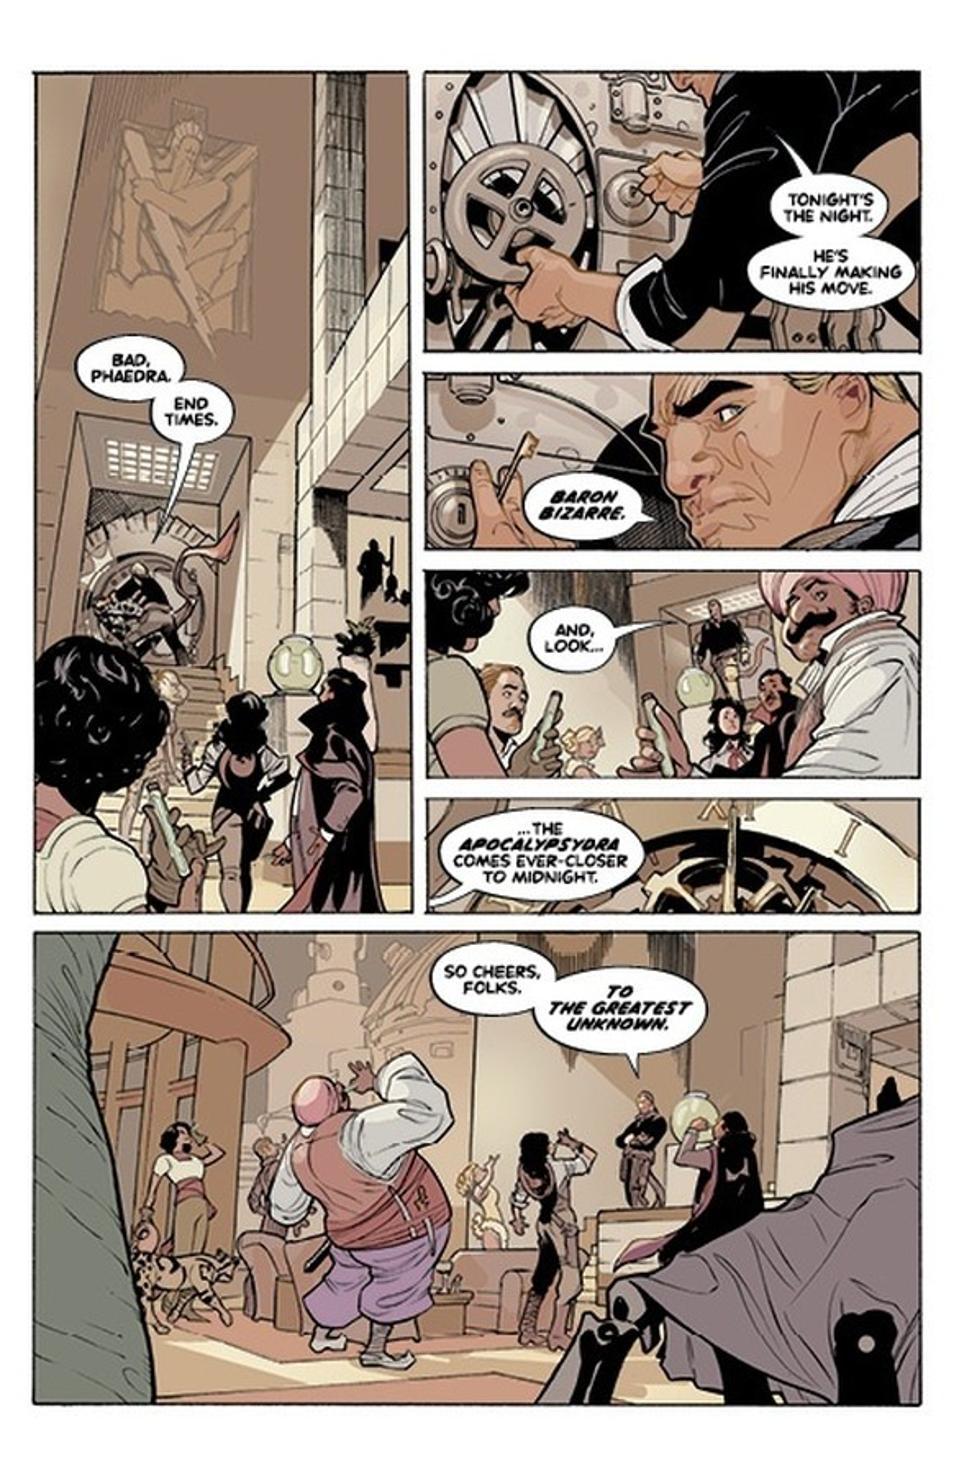 Courtesy of Image Comics